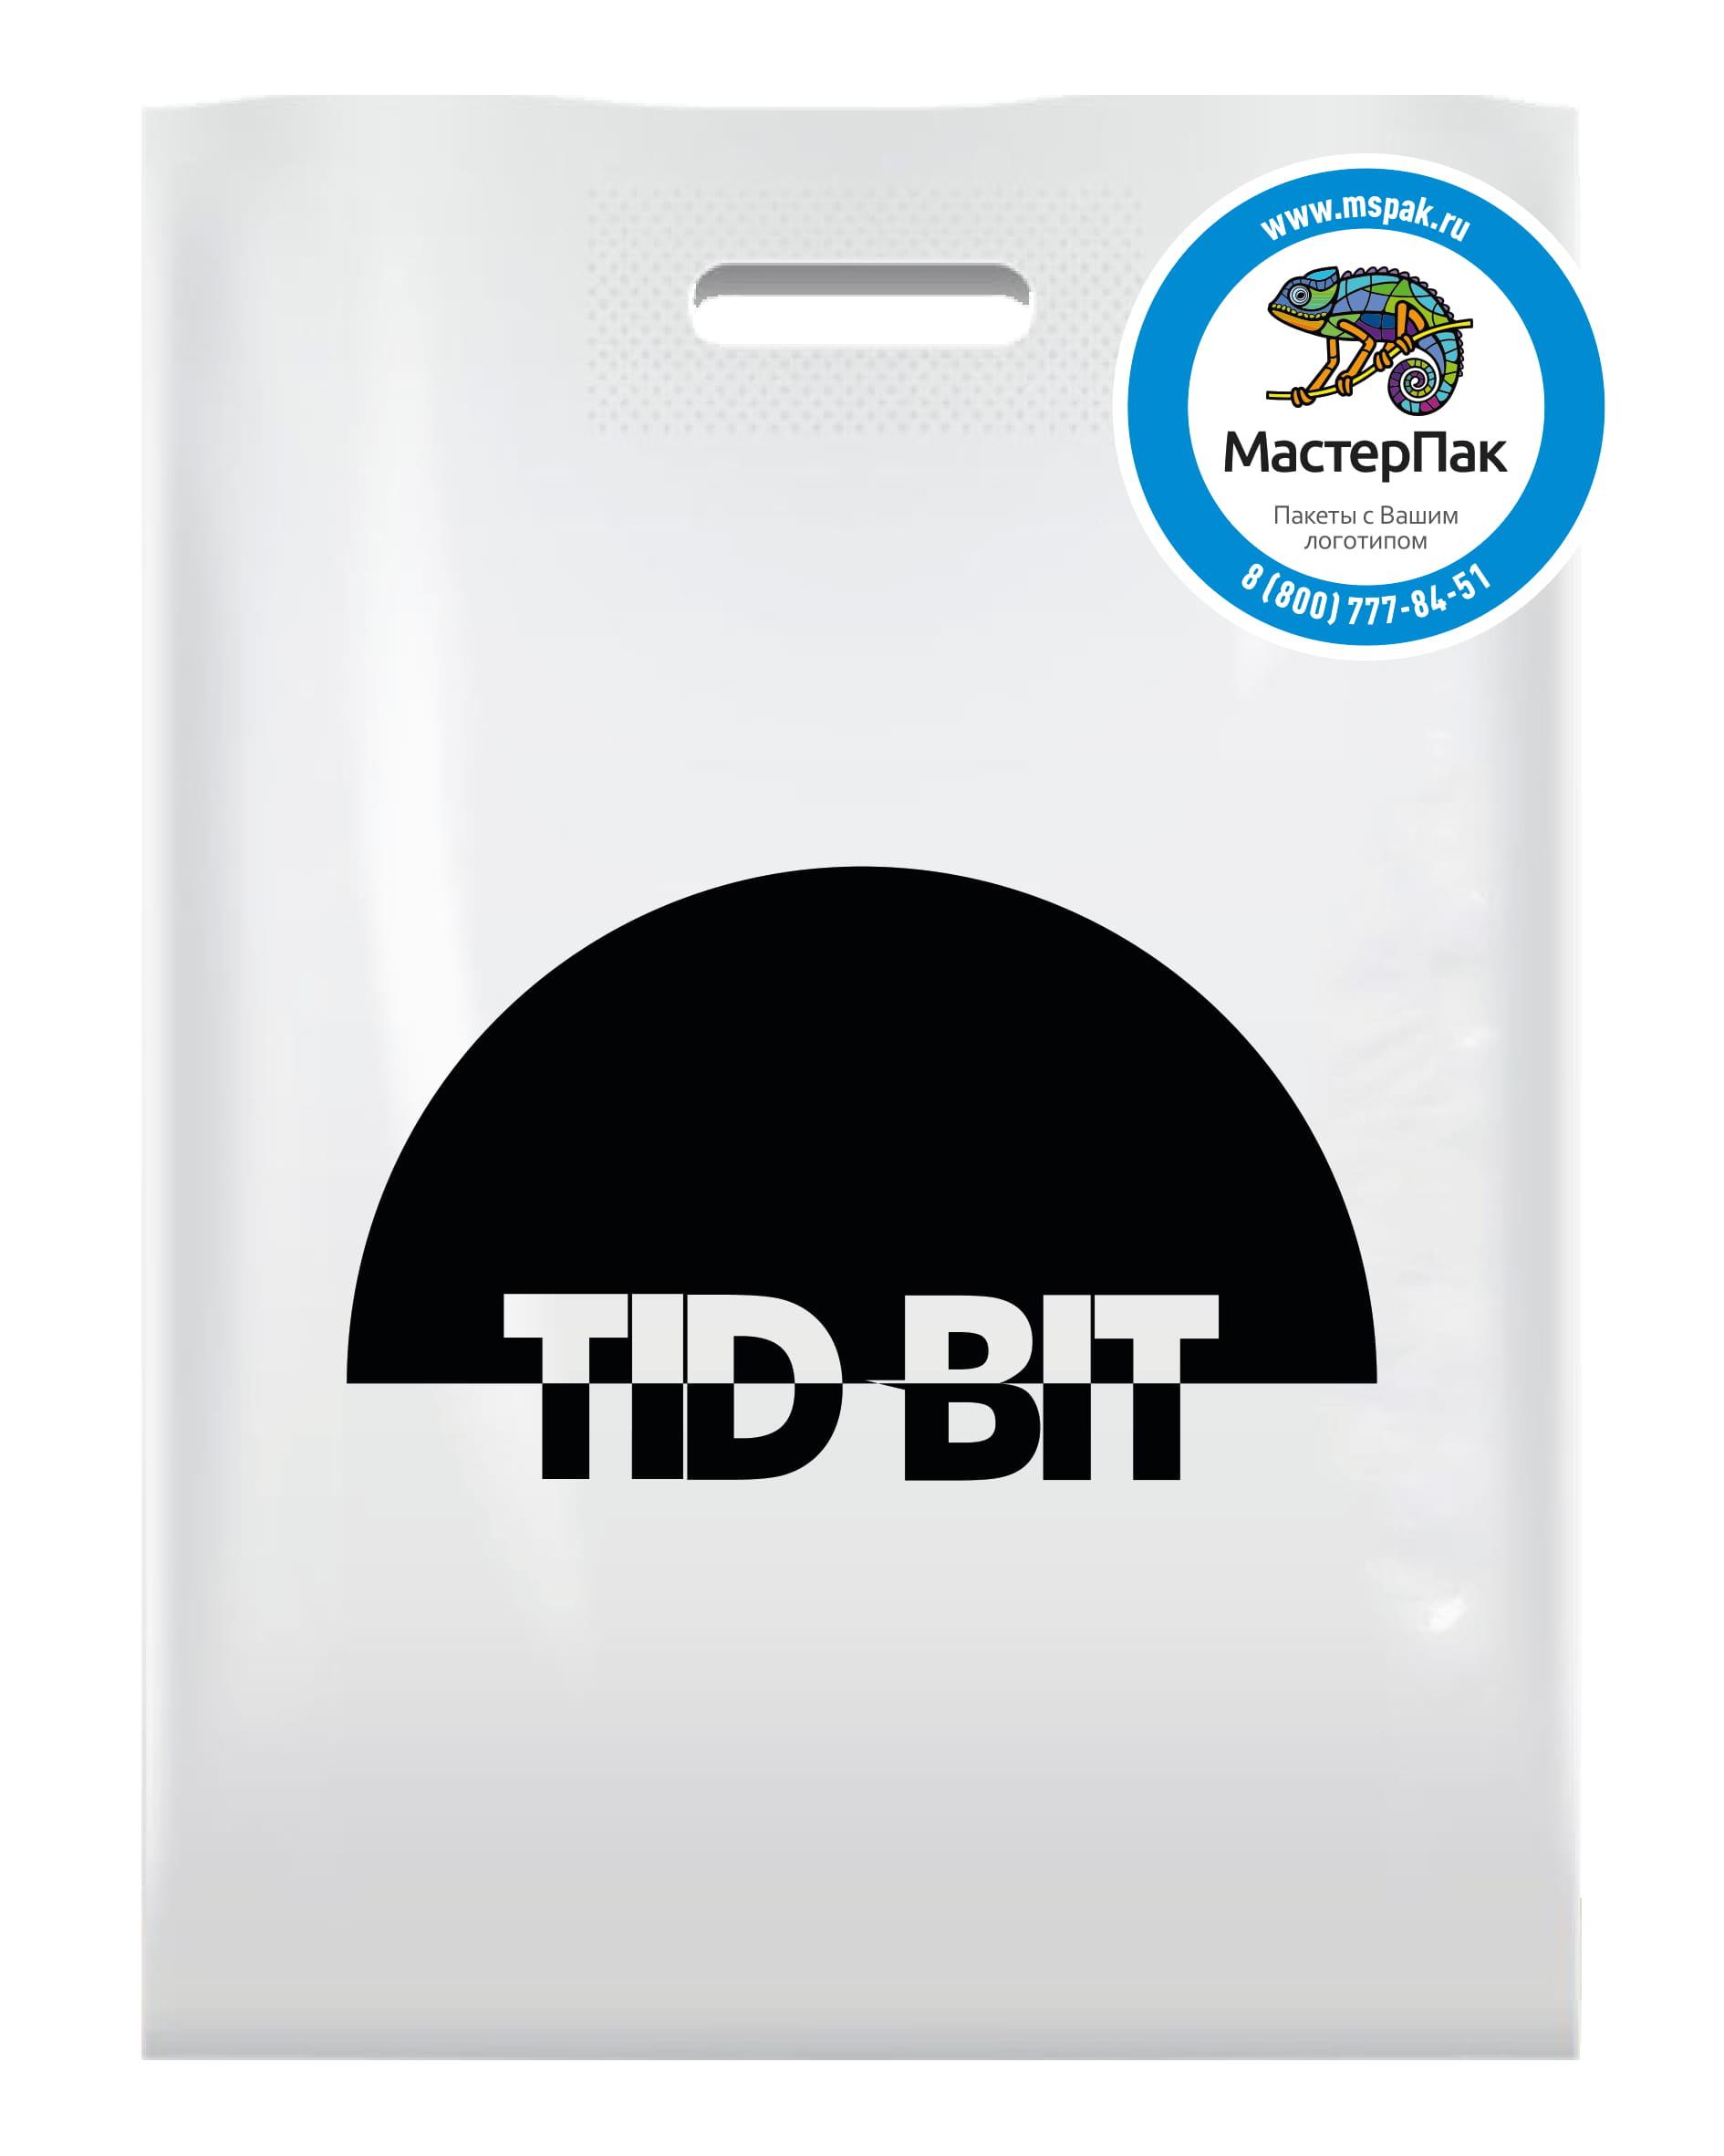 Пакет ПВД с логотипом кондитерской Tid Bit, Москва